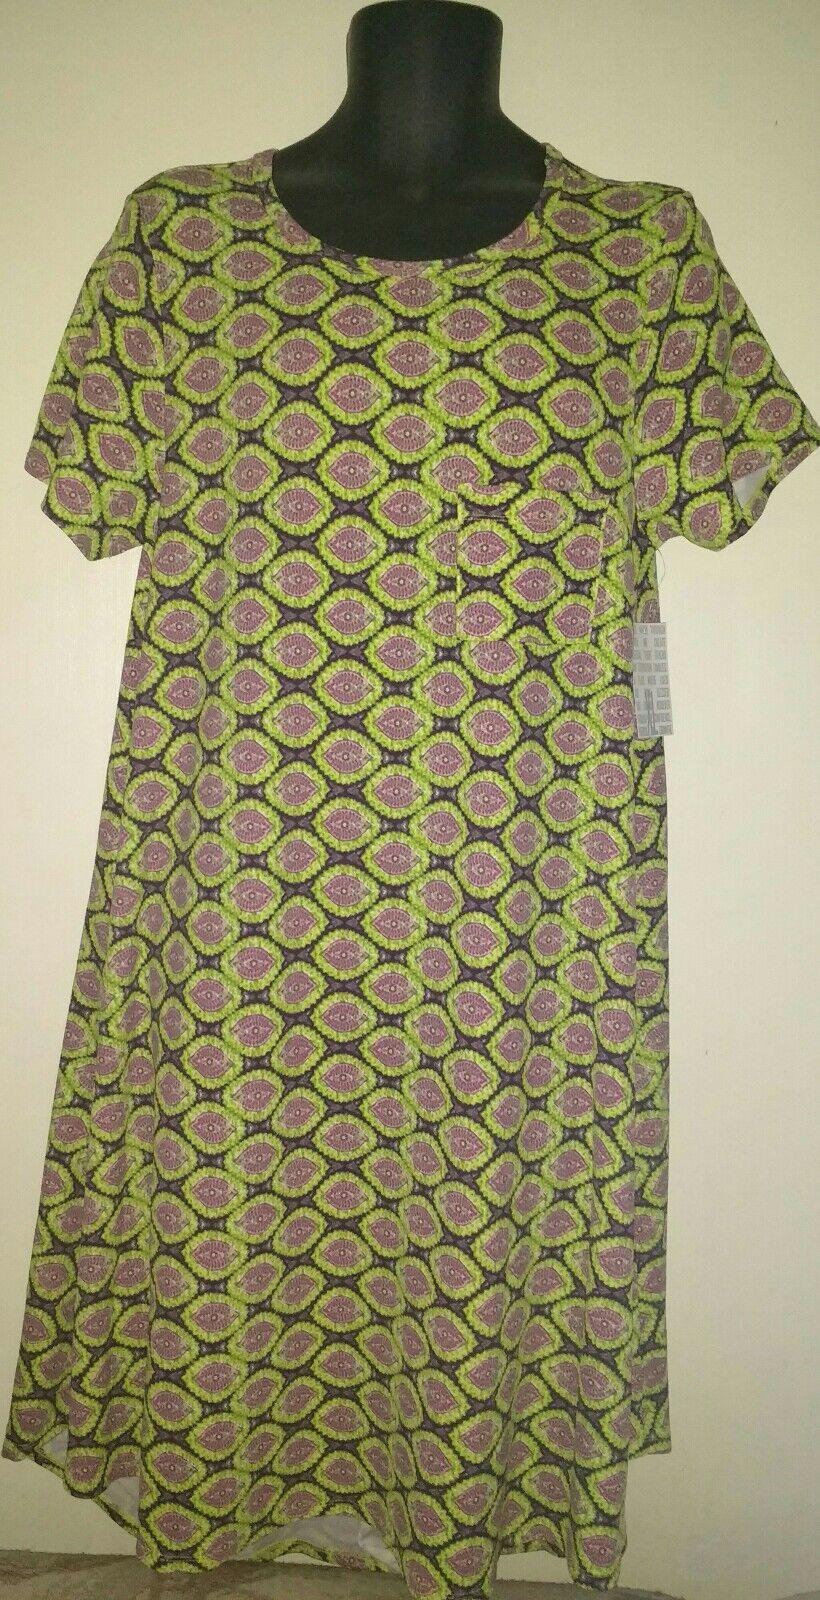 868a75f9 Lularoe Carly Dress XL NWT Pink, Purple,Green Print Jacquard Material